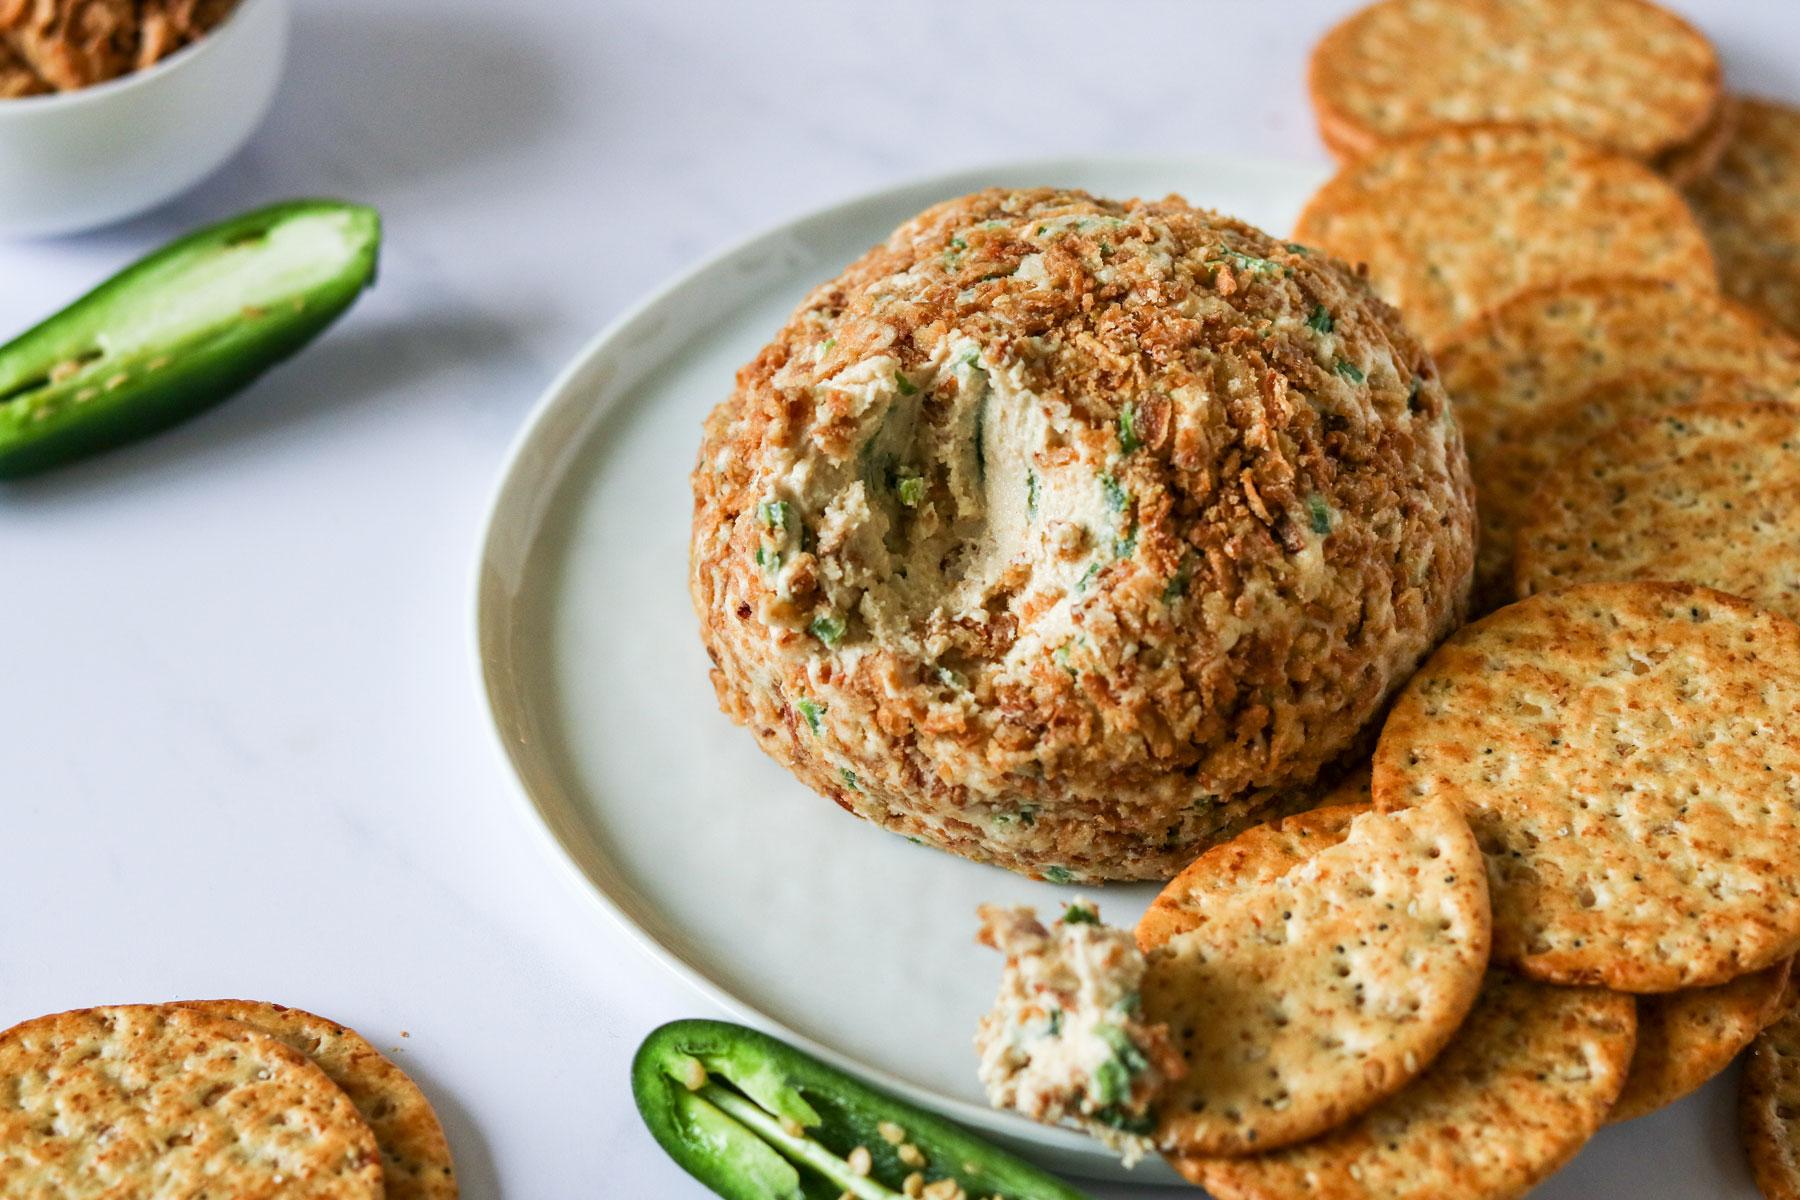 Jalapeño Popper Vegan Cheese Ball Recipe